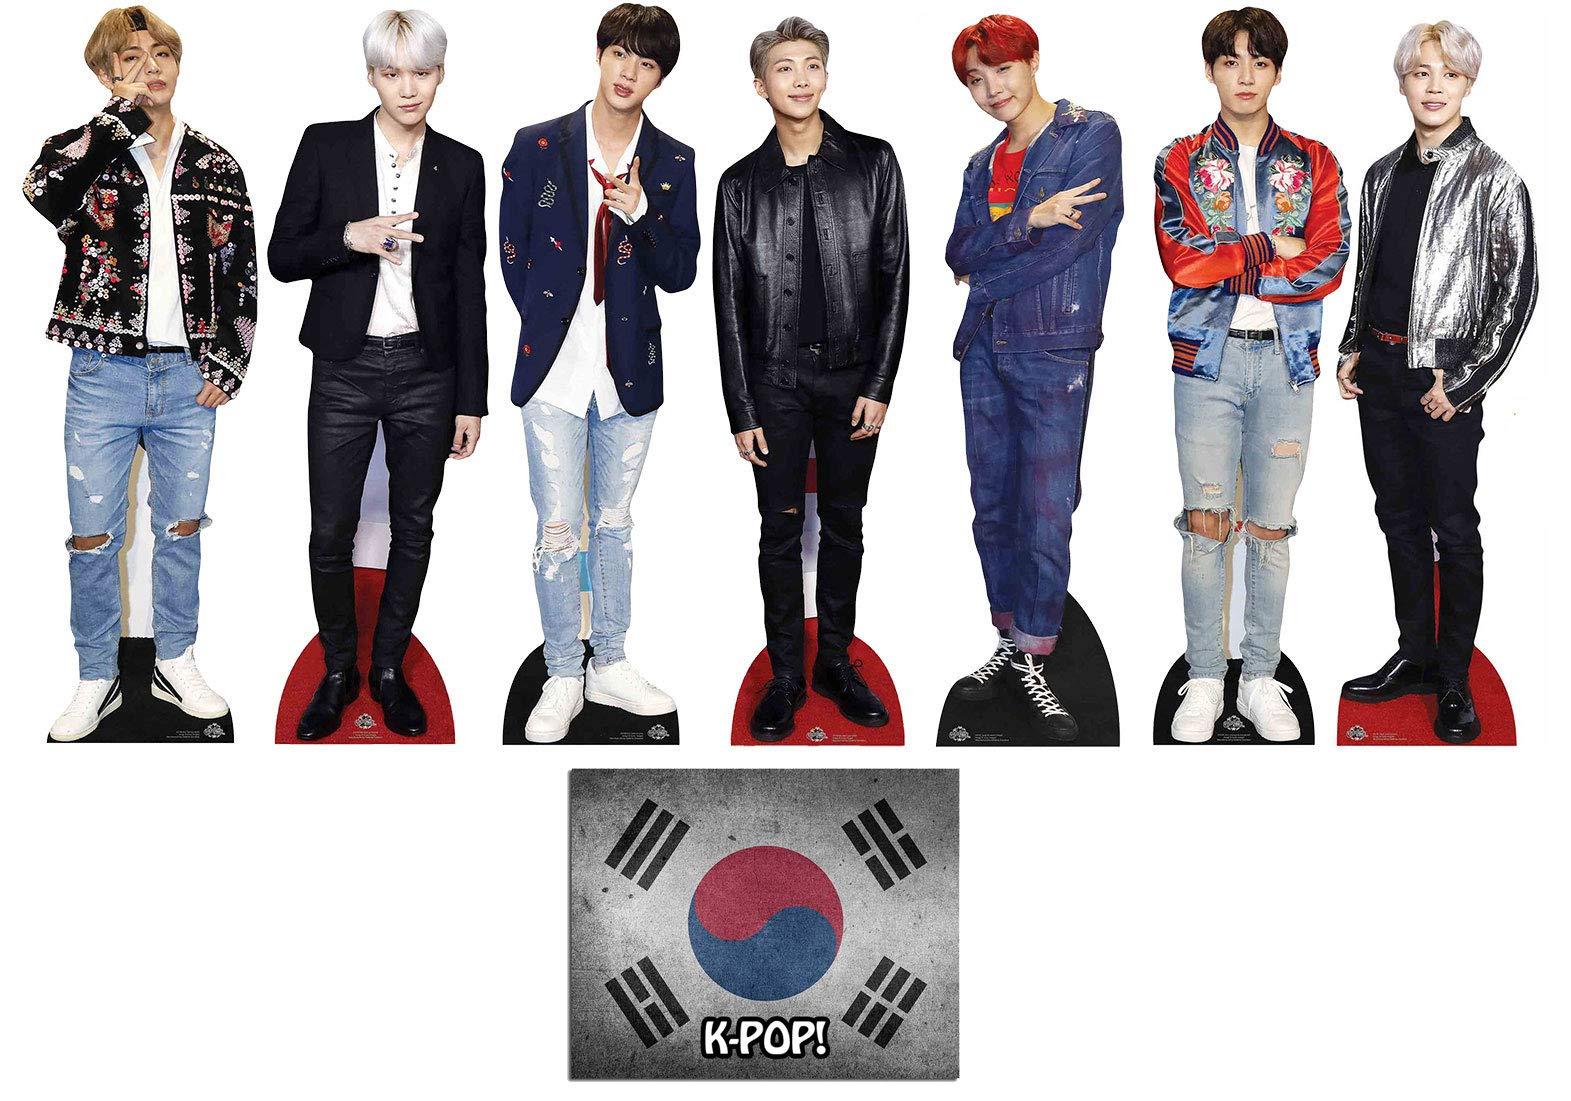 Bangtan Boys with V, Suga, Jin, Jungkook, RM, Jimin and J-Hope Set of 7 Mini Cardboard Cutouts, Fan Pack, Includes 8x10 Star Photo